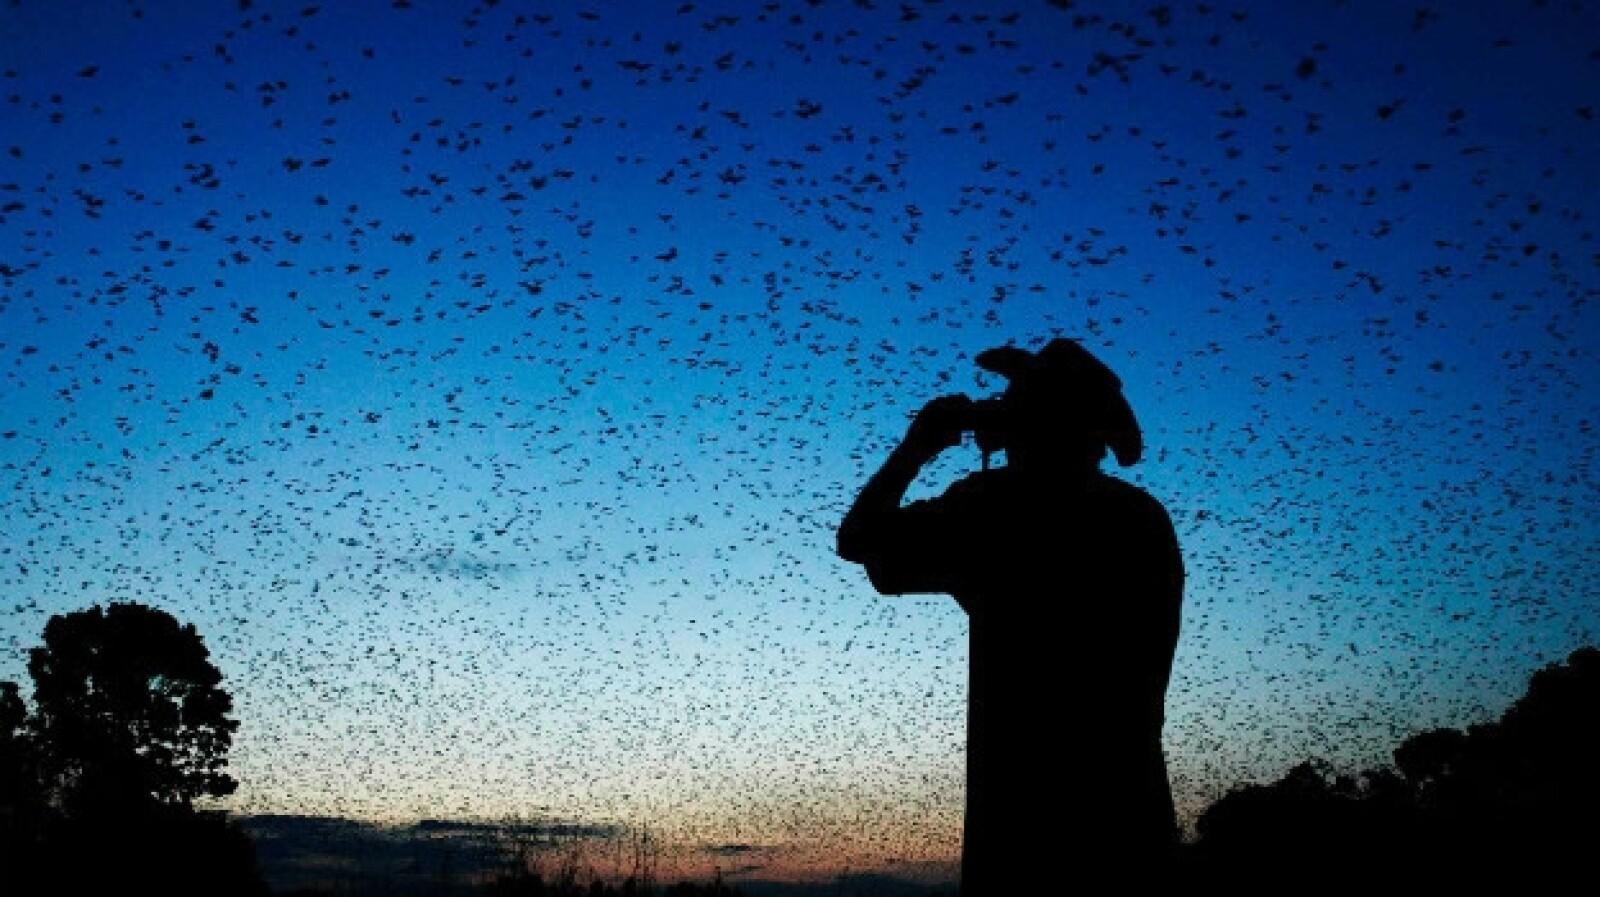 Kasanka bat migration, Zambia